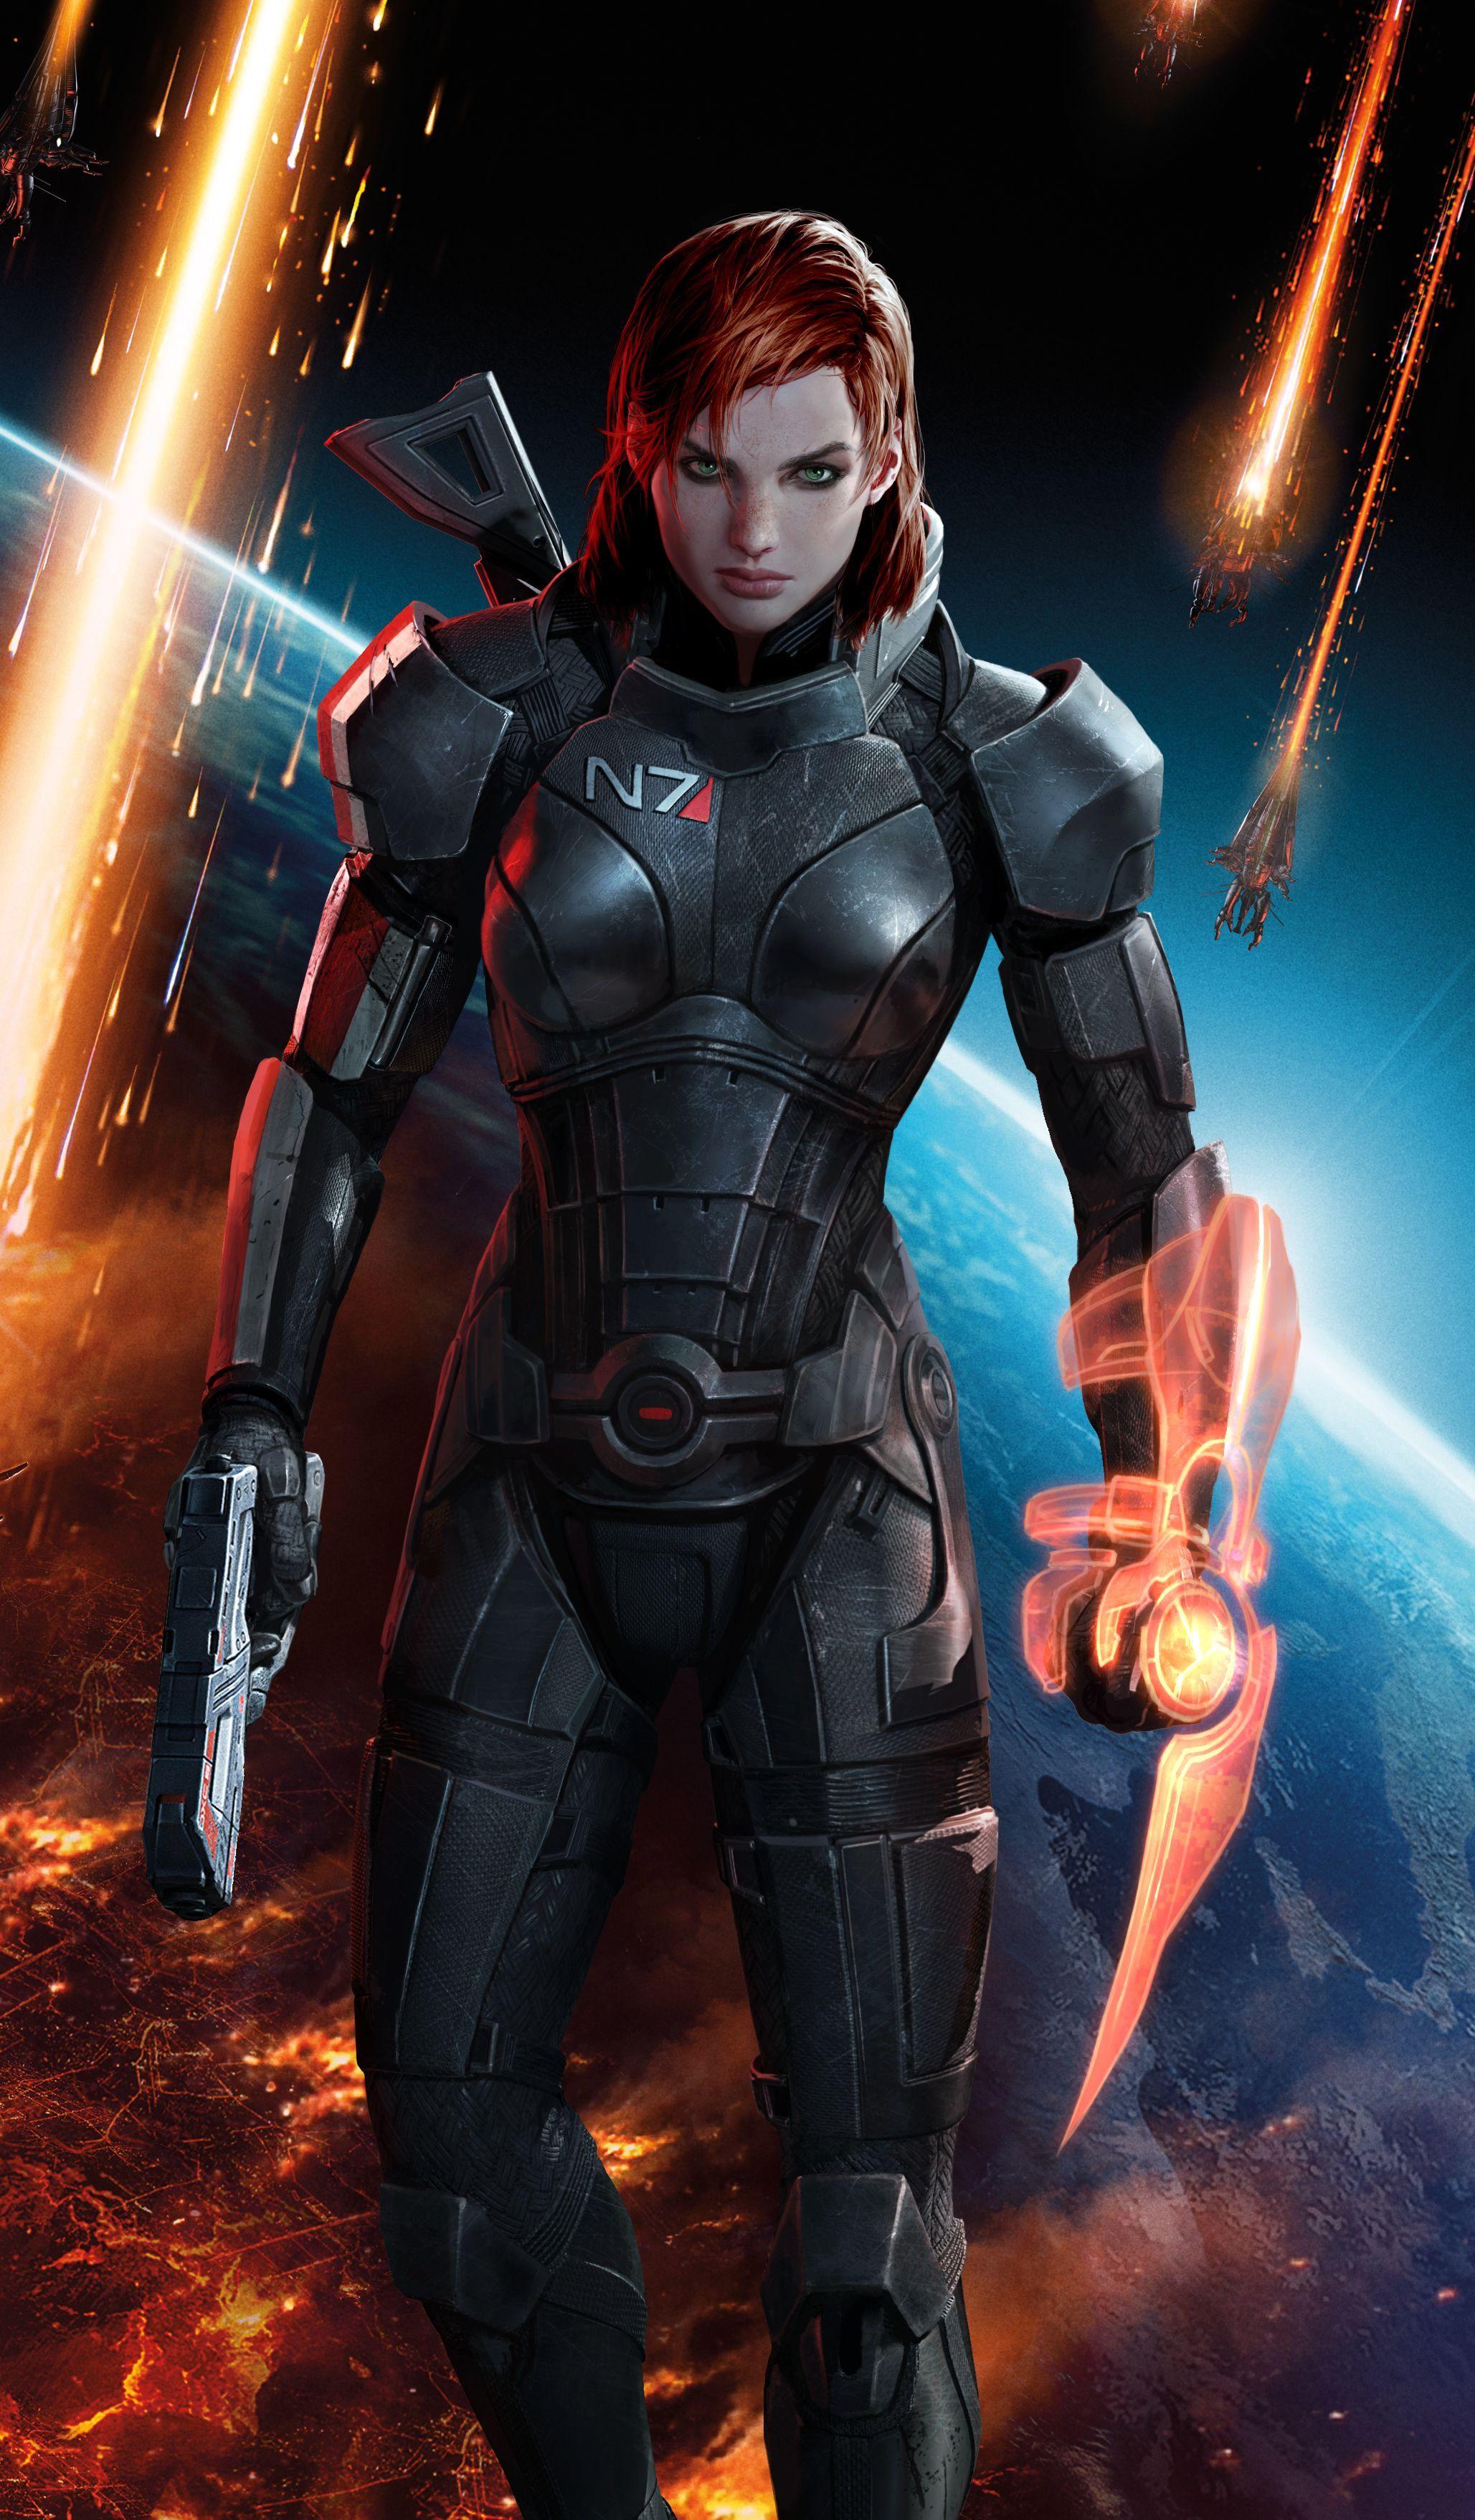 mass effect 3 jane shepard female main character video games